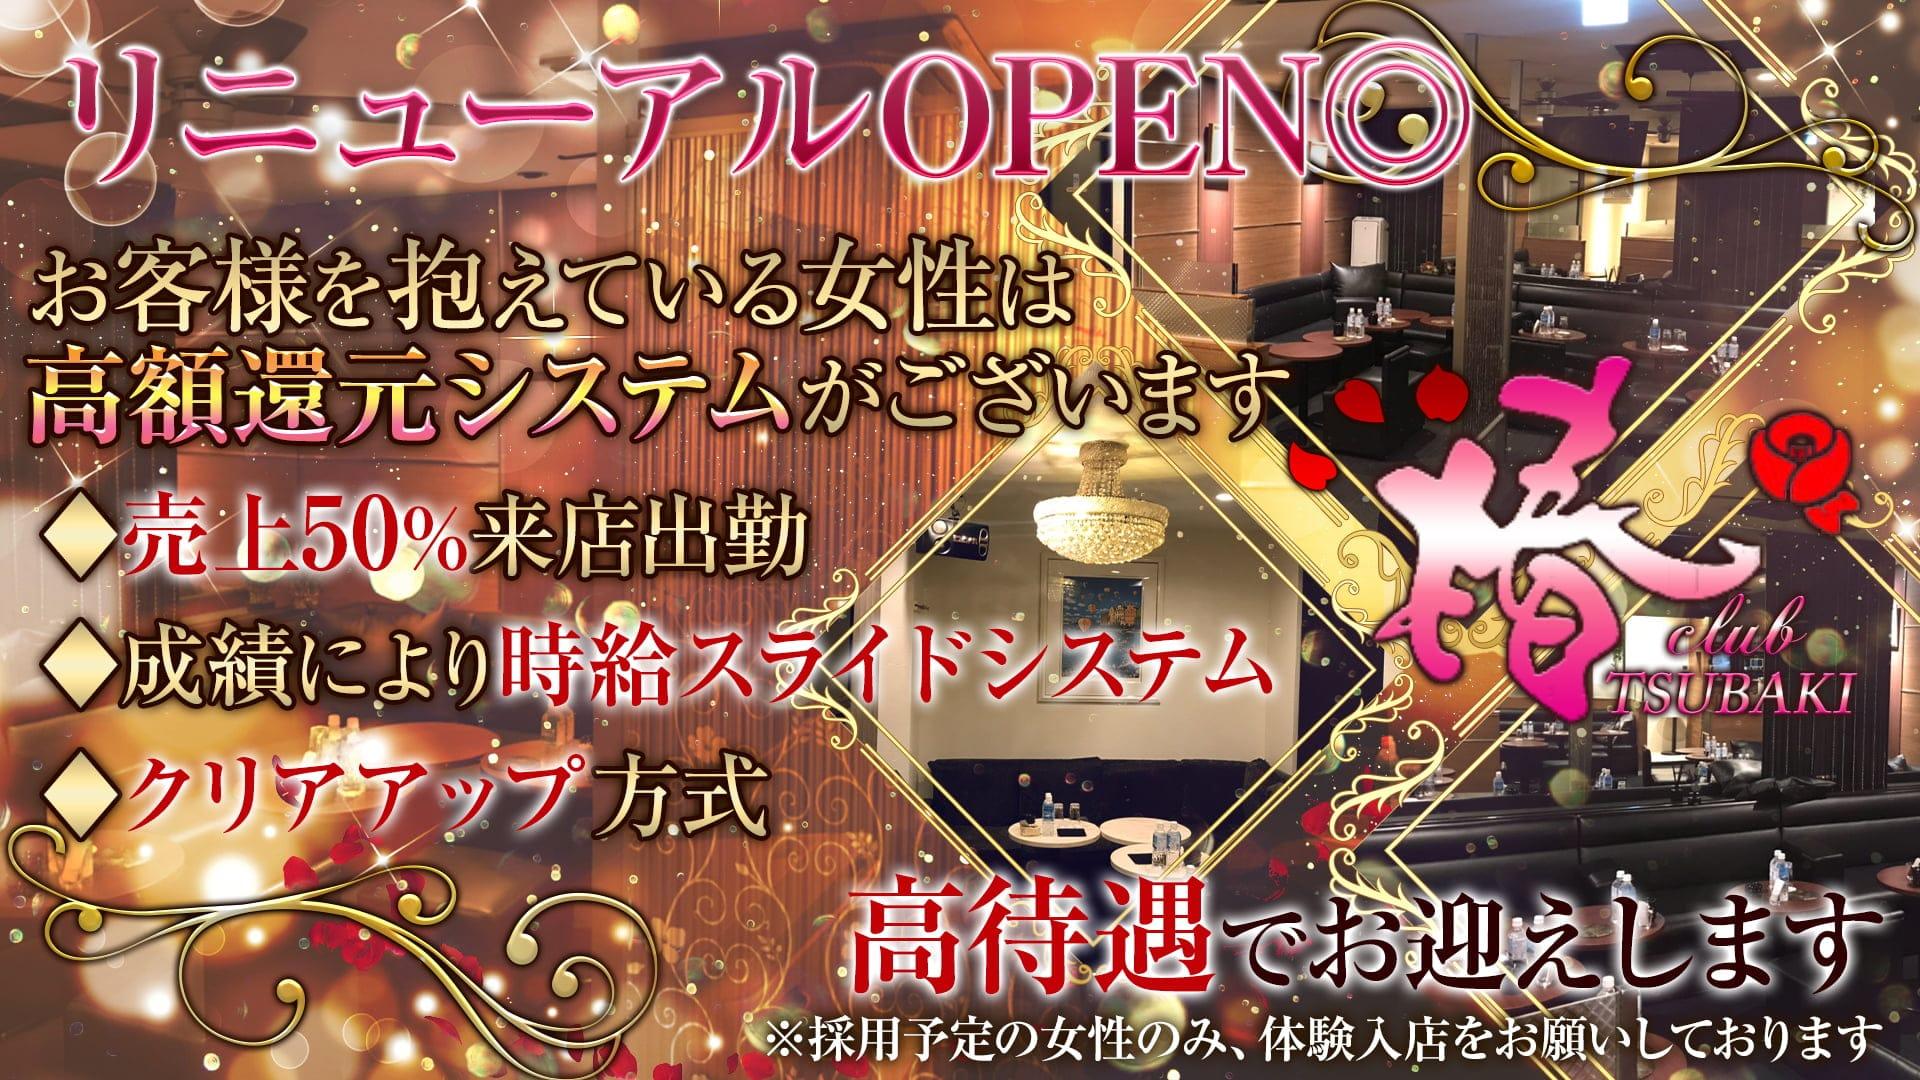 club 椿(クラブ ツバキ)【公式求人・体入情報】 上野ニュークラブ TOP画像